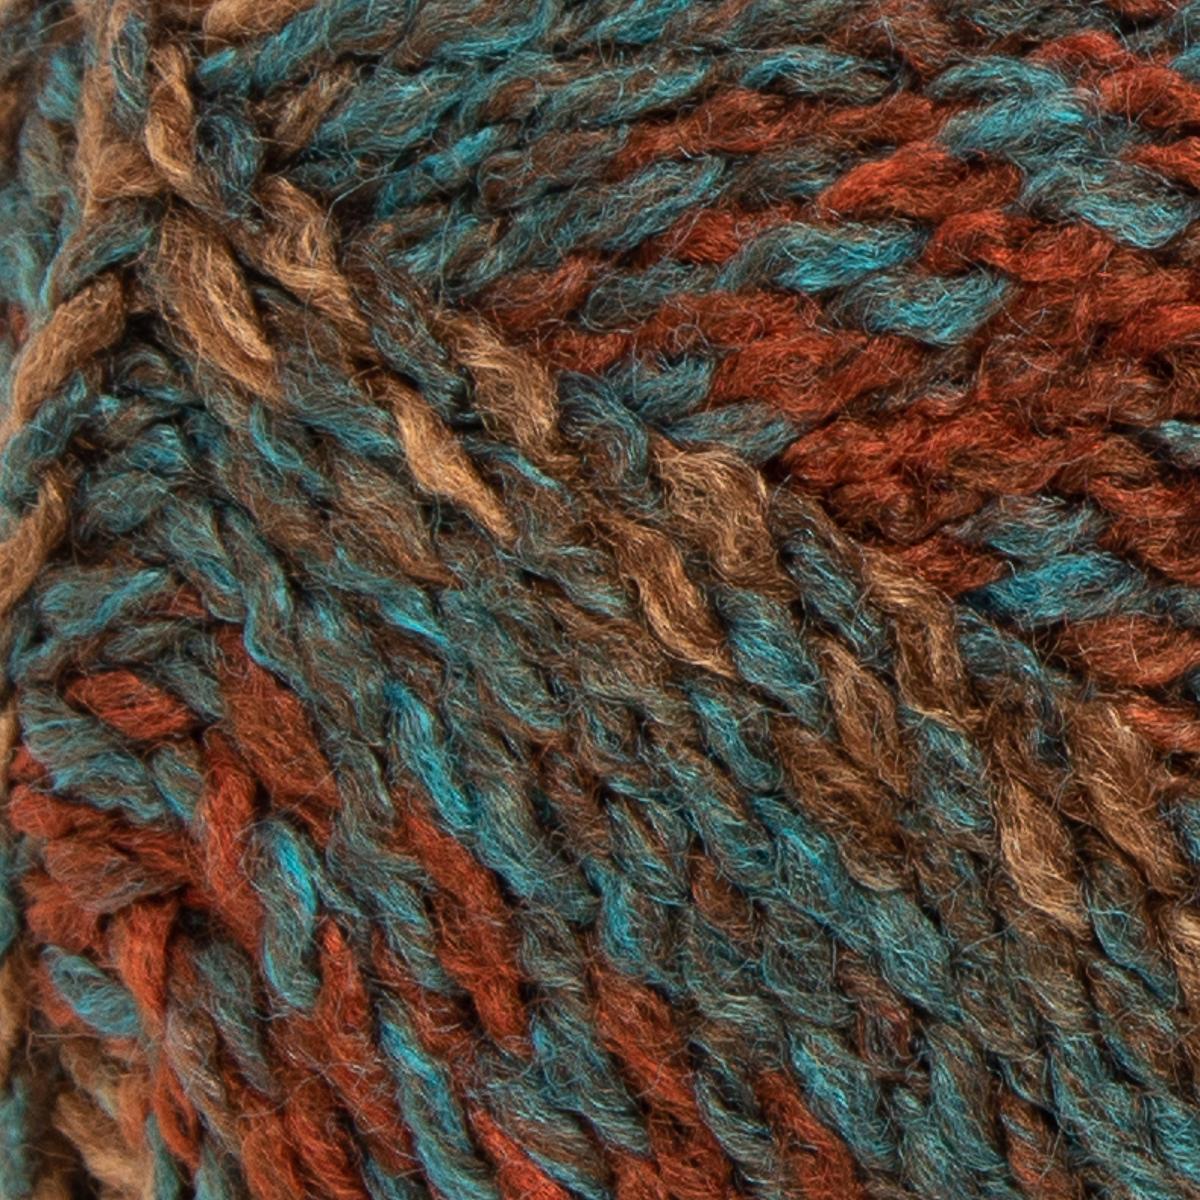 3pk-Lion-Brand-Yarn-100-Acrylic-Chunky-Yarn-Bulky-5-Soft-Knitting-Crocheting thumbnail 26